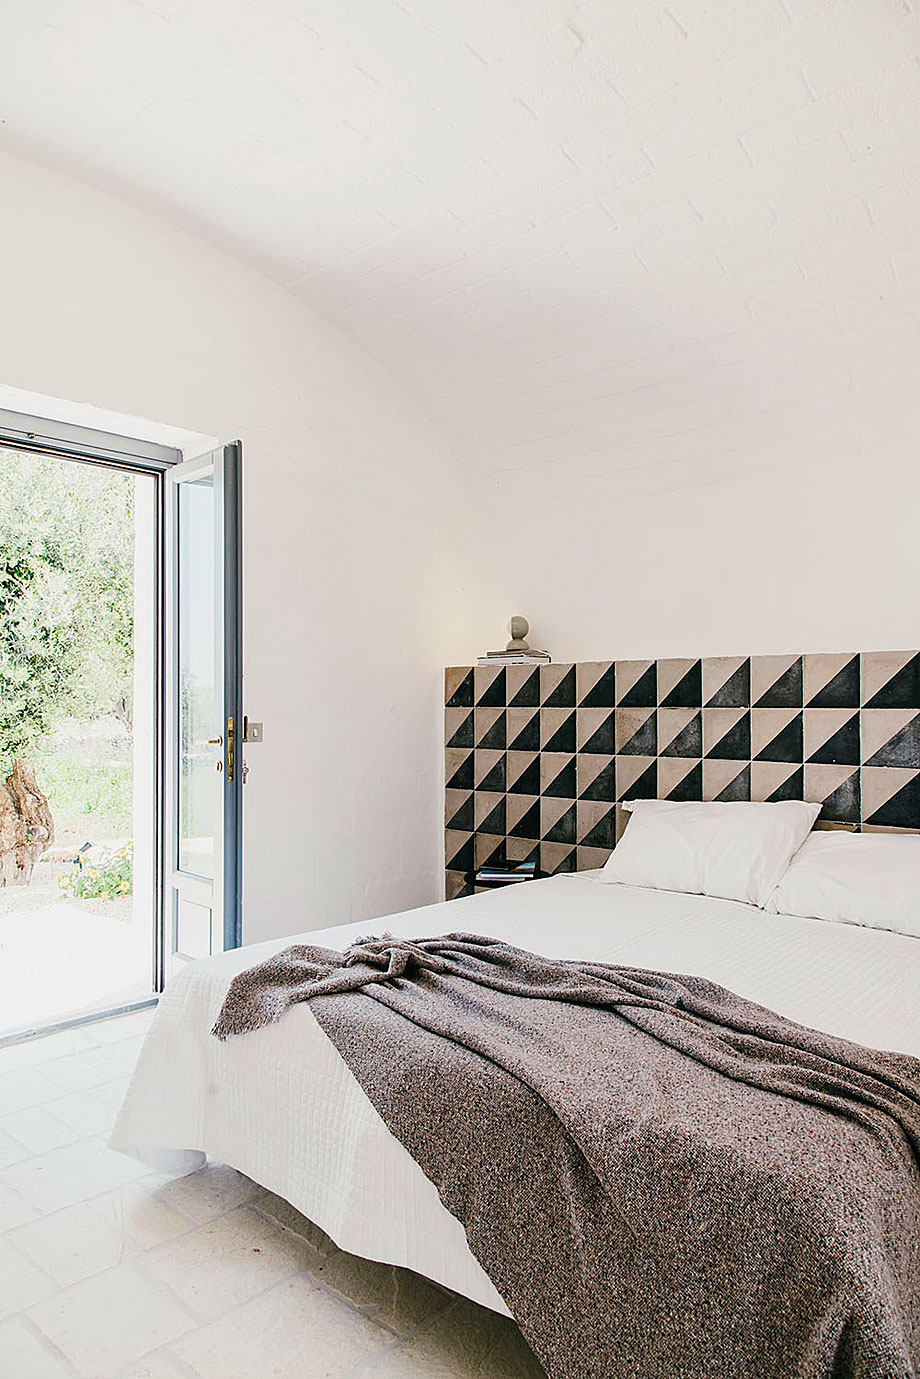 masseria-moroseta-andrew-trotter-architecture-puglia-ostuni-openhouse-13